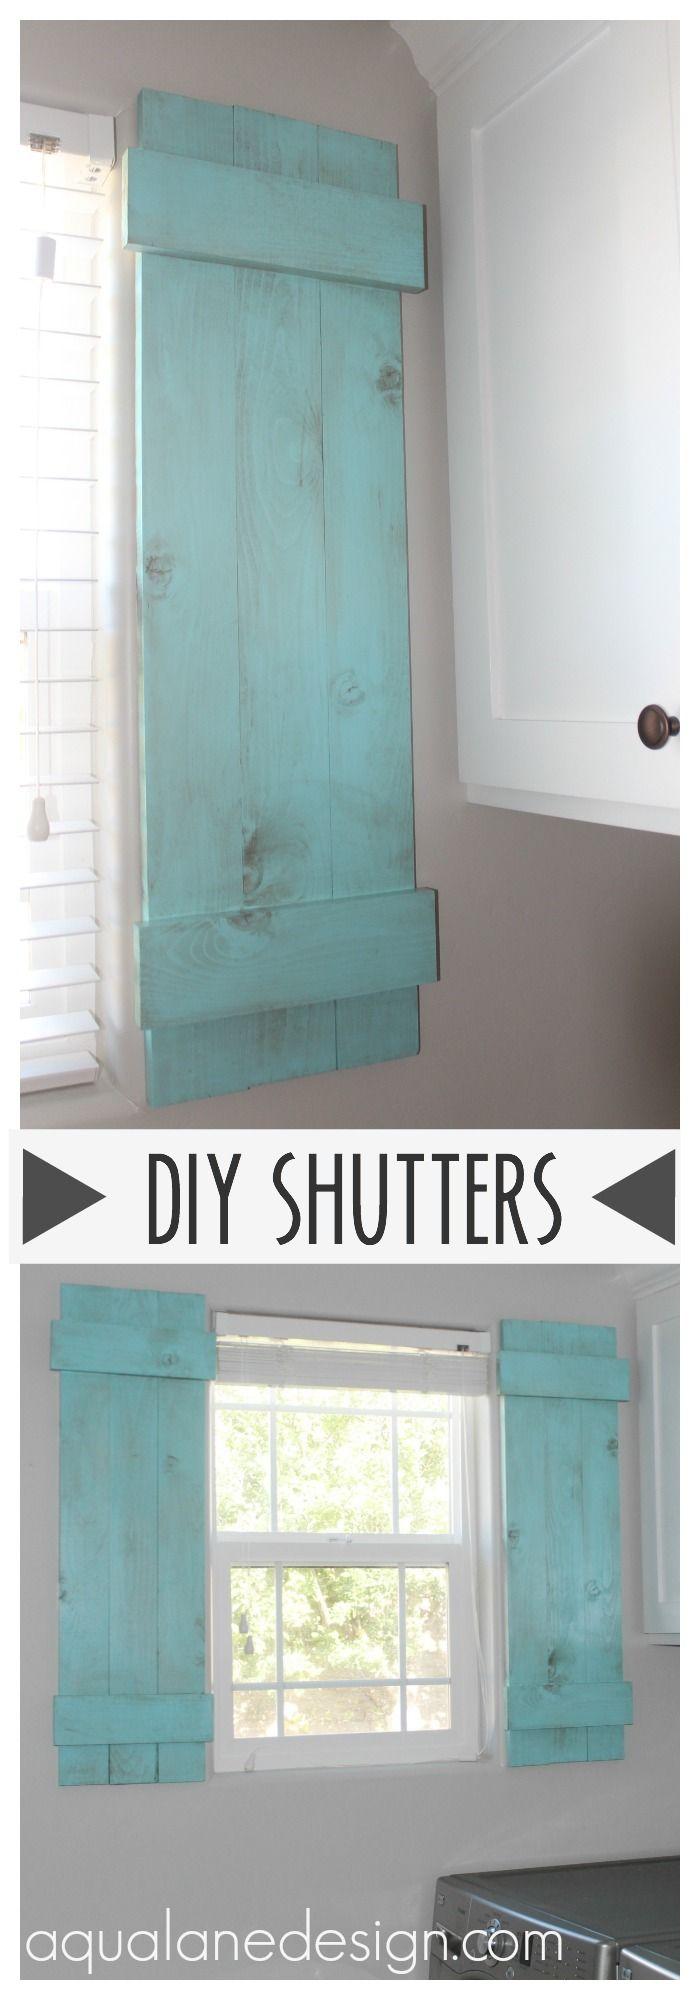 Diy Exterior Window Shutters Best 10 Diy Shutters Ideas On Pinterest Shutters Pallet